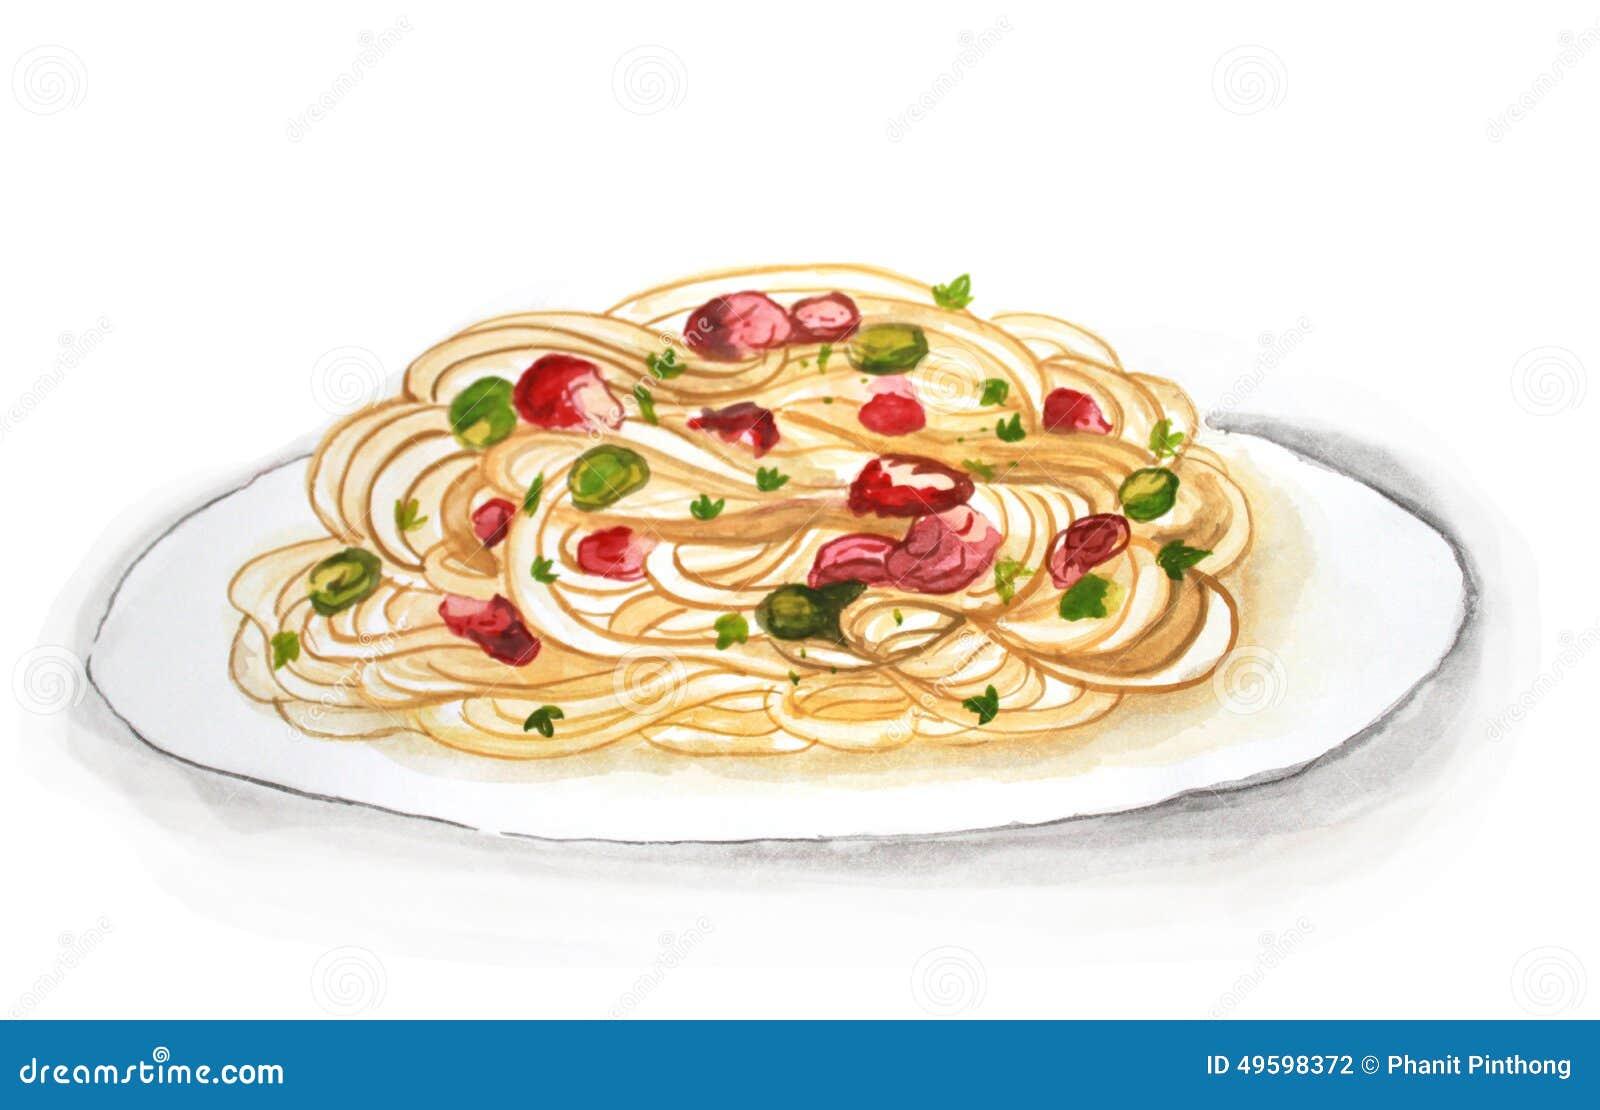 Рисунок макарон